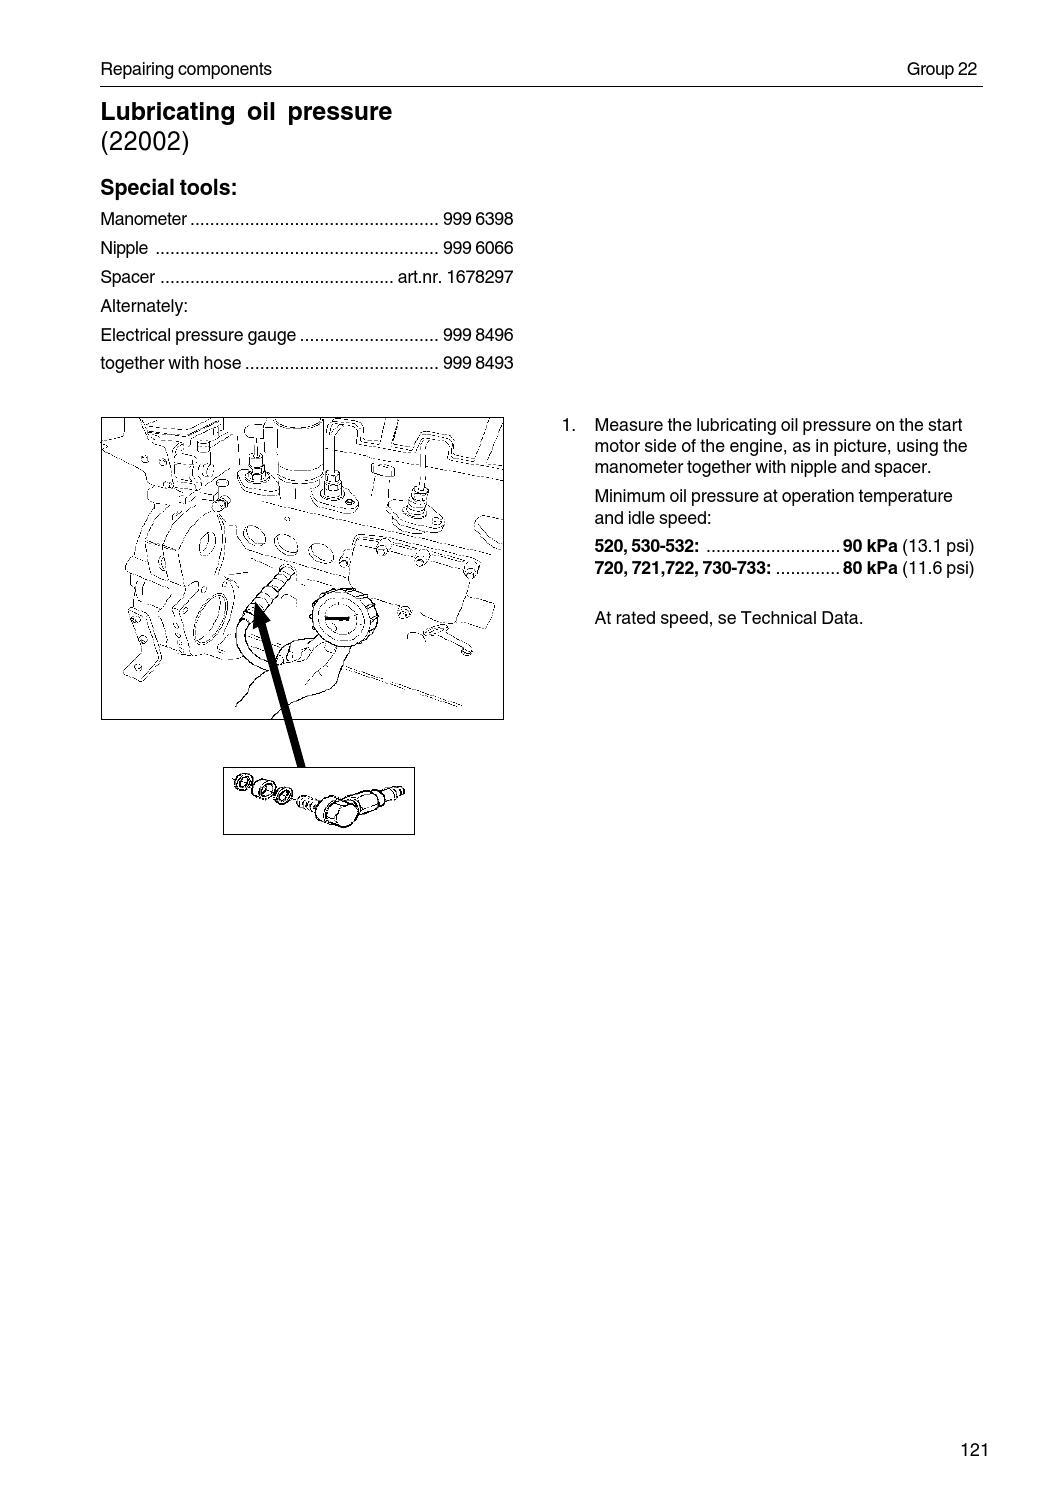 Volvo Work Shop Manual 520 733 By Power Generation Issuu Kia Sorento D4cb Engine Wiring Diagrams